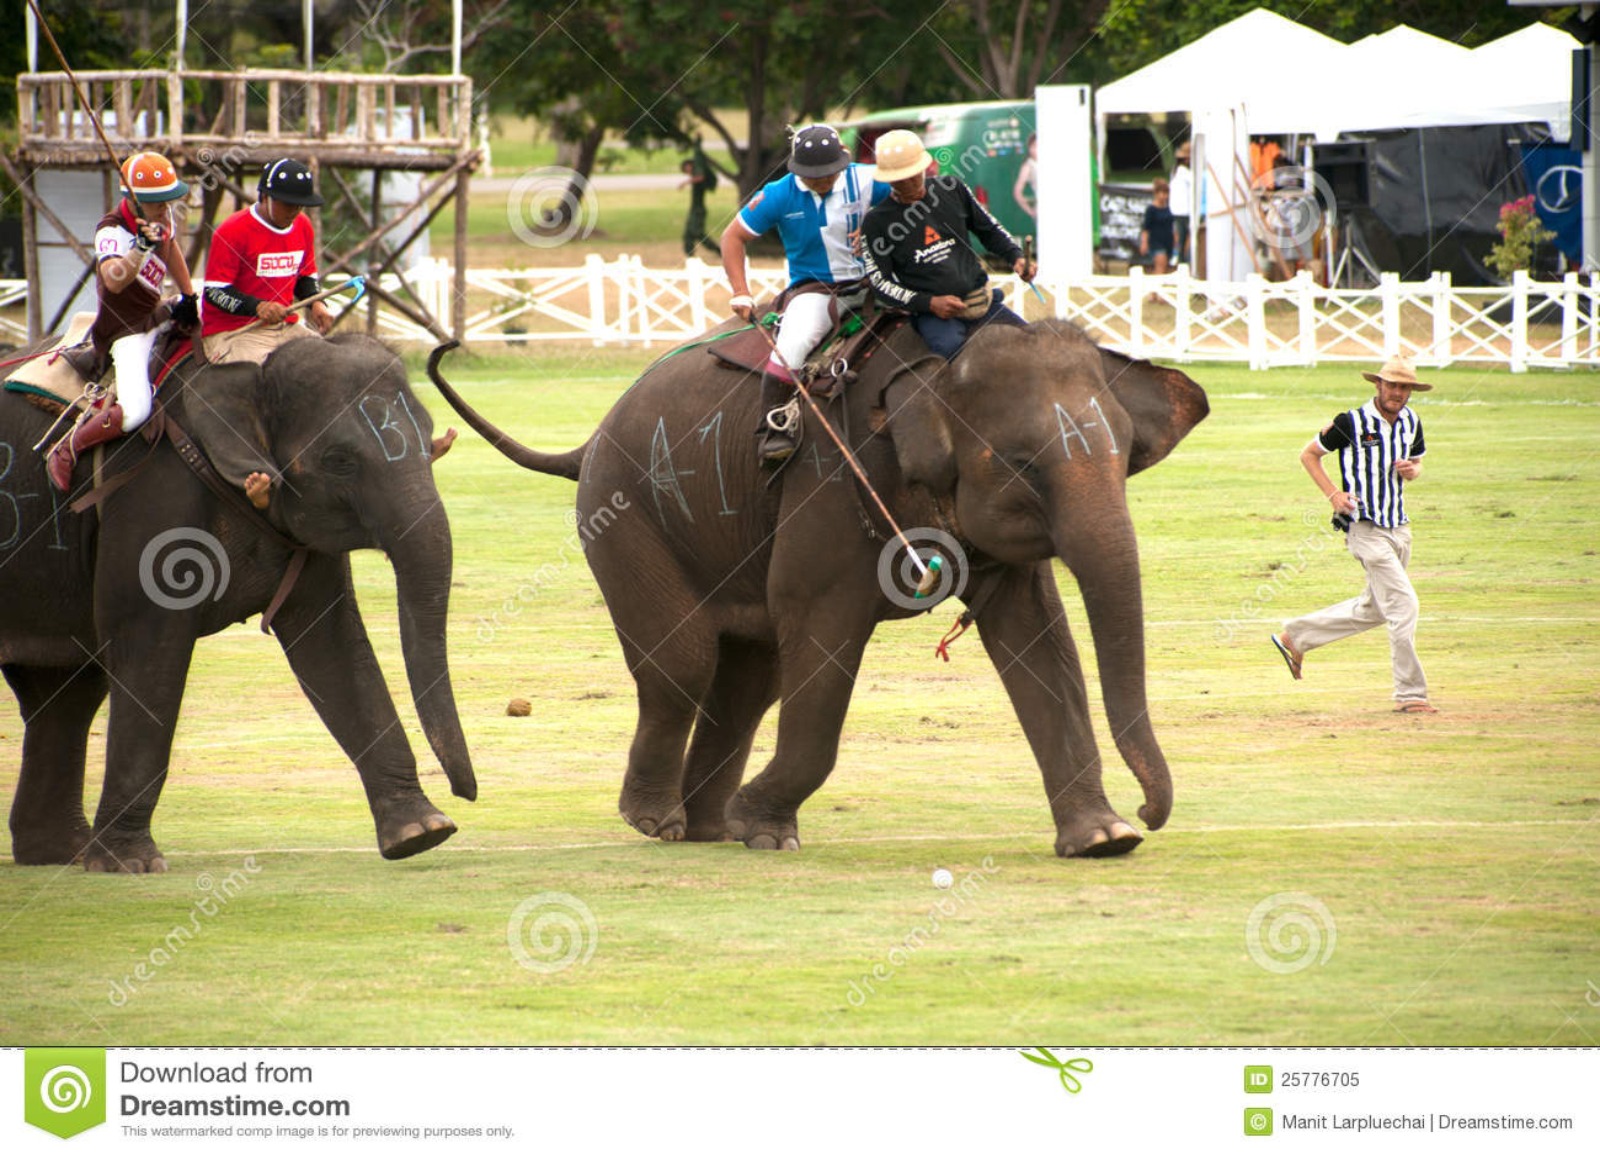 Elephant Polo Game. Editorial Image - Image: 25776705 Elephant Games